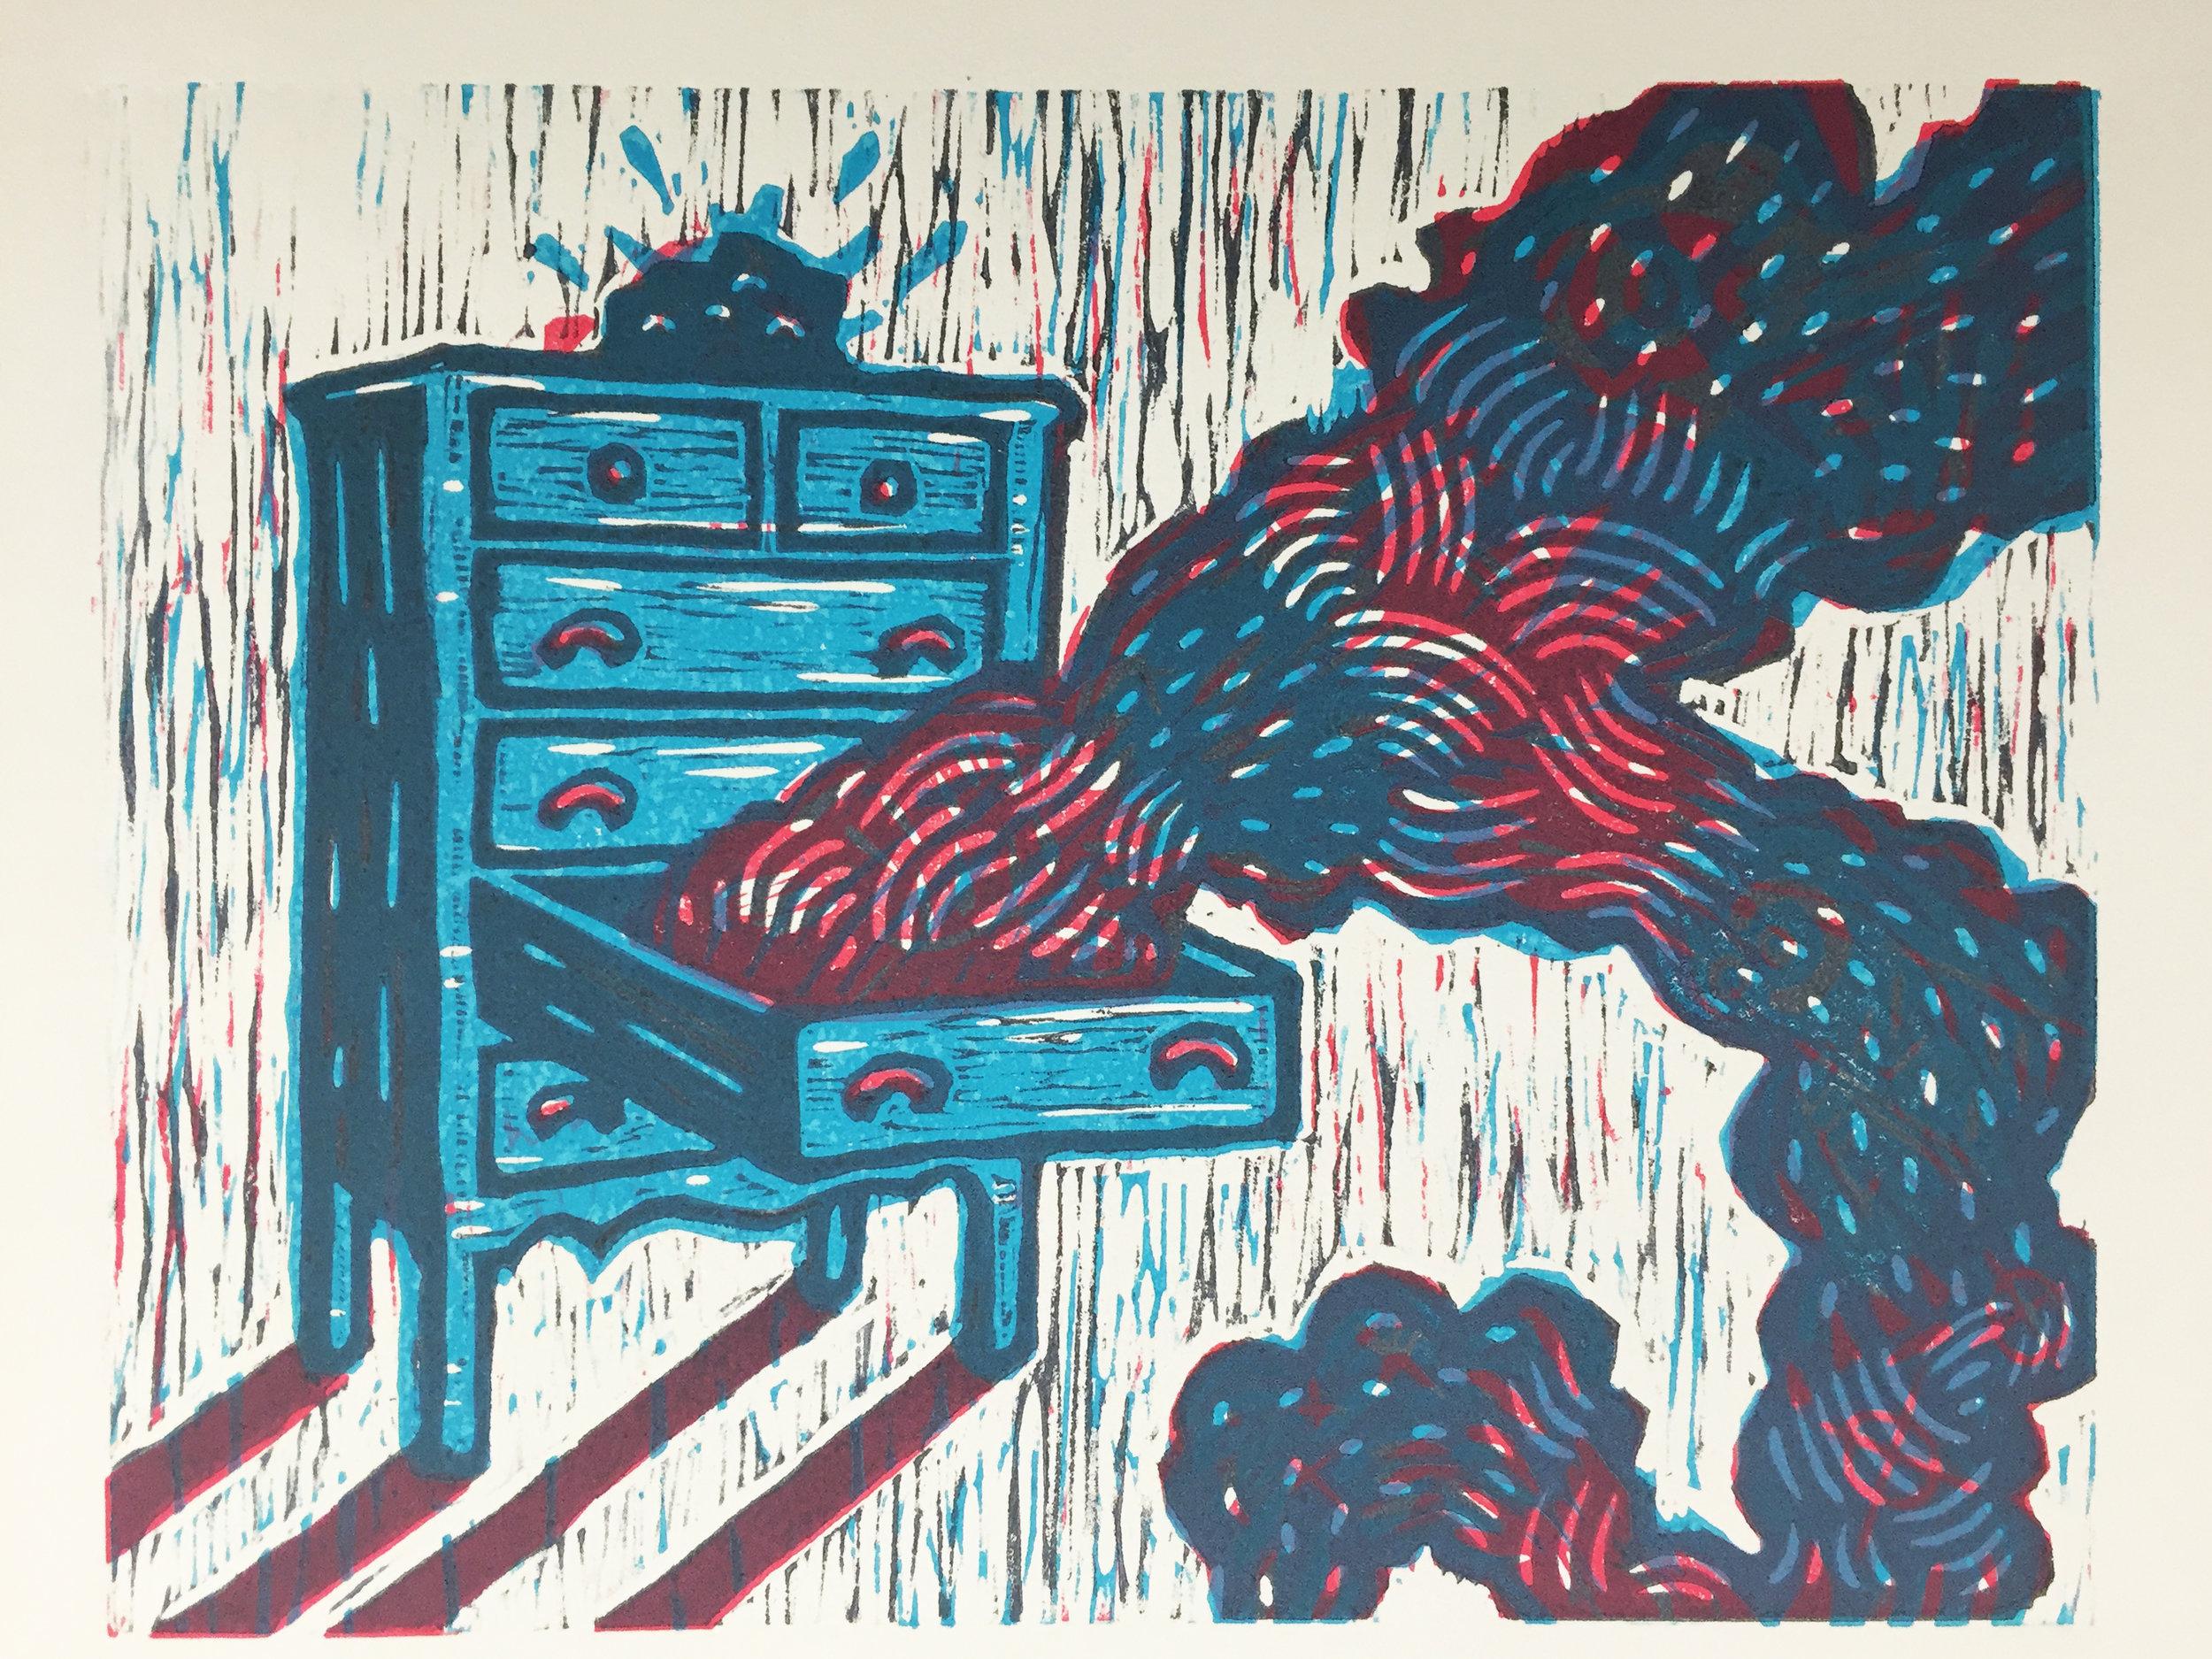 drawers_chest.jpg